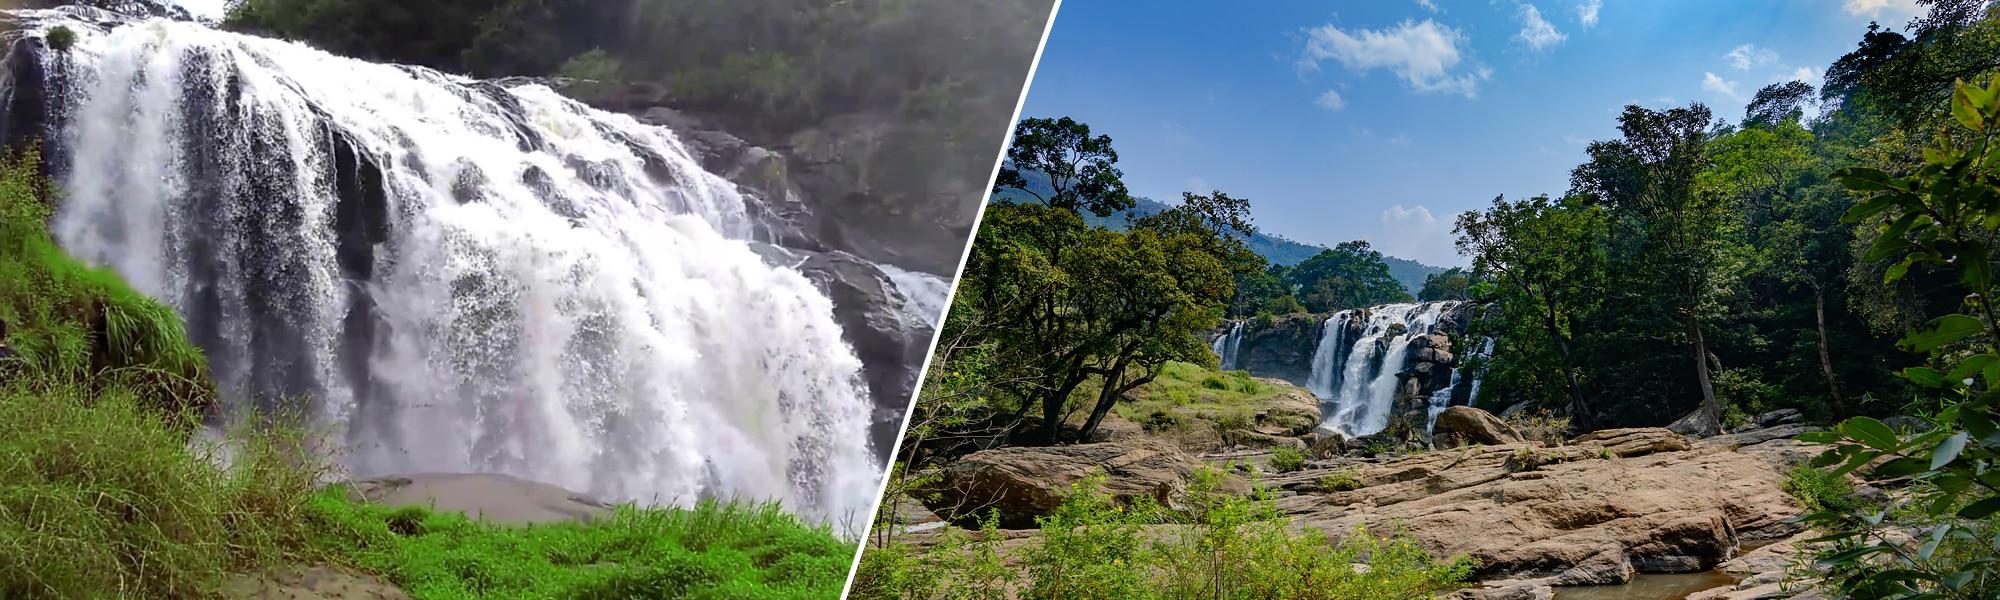 Thoovanam waterfall